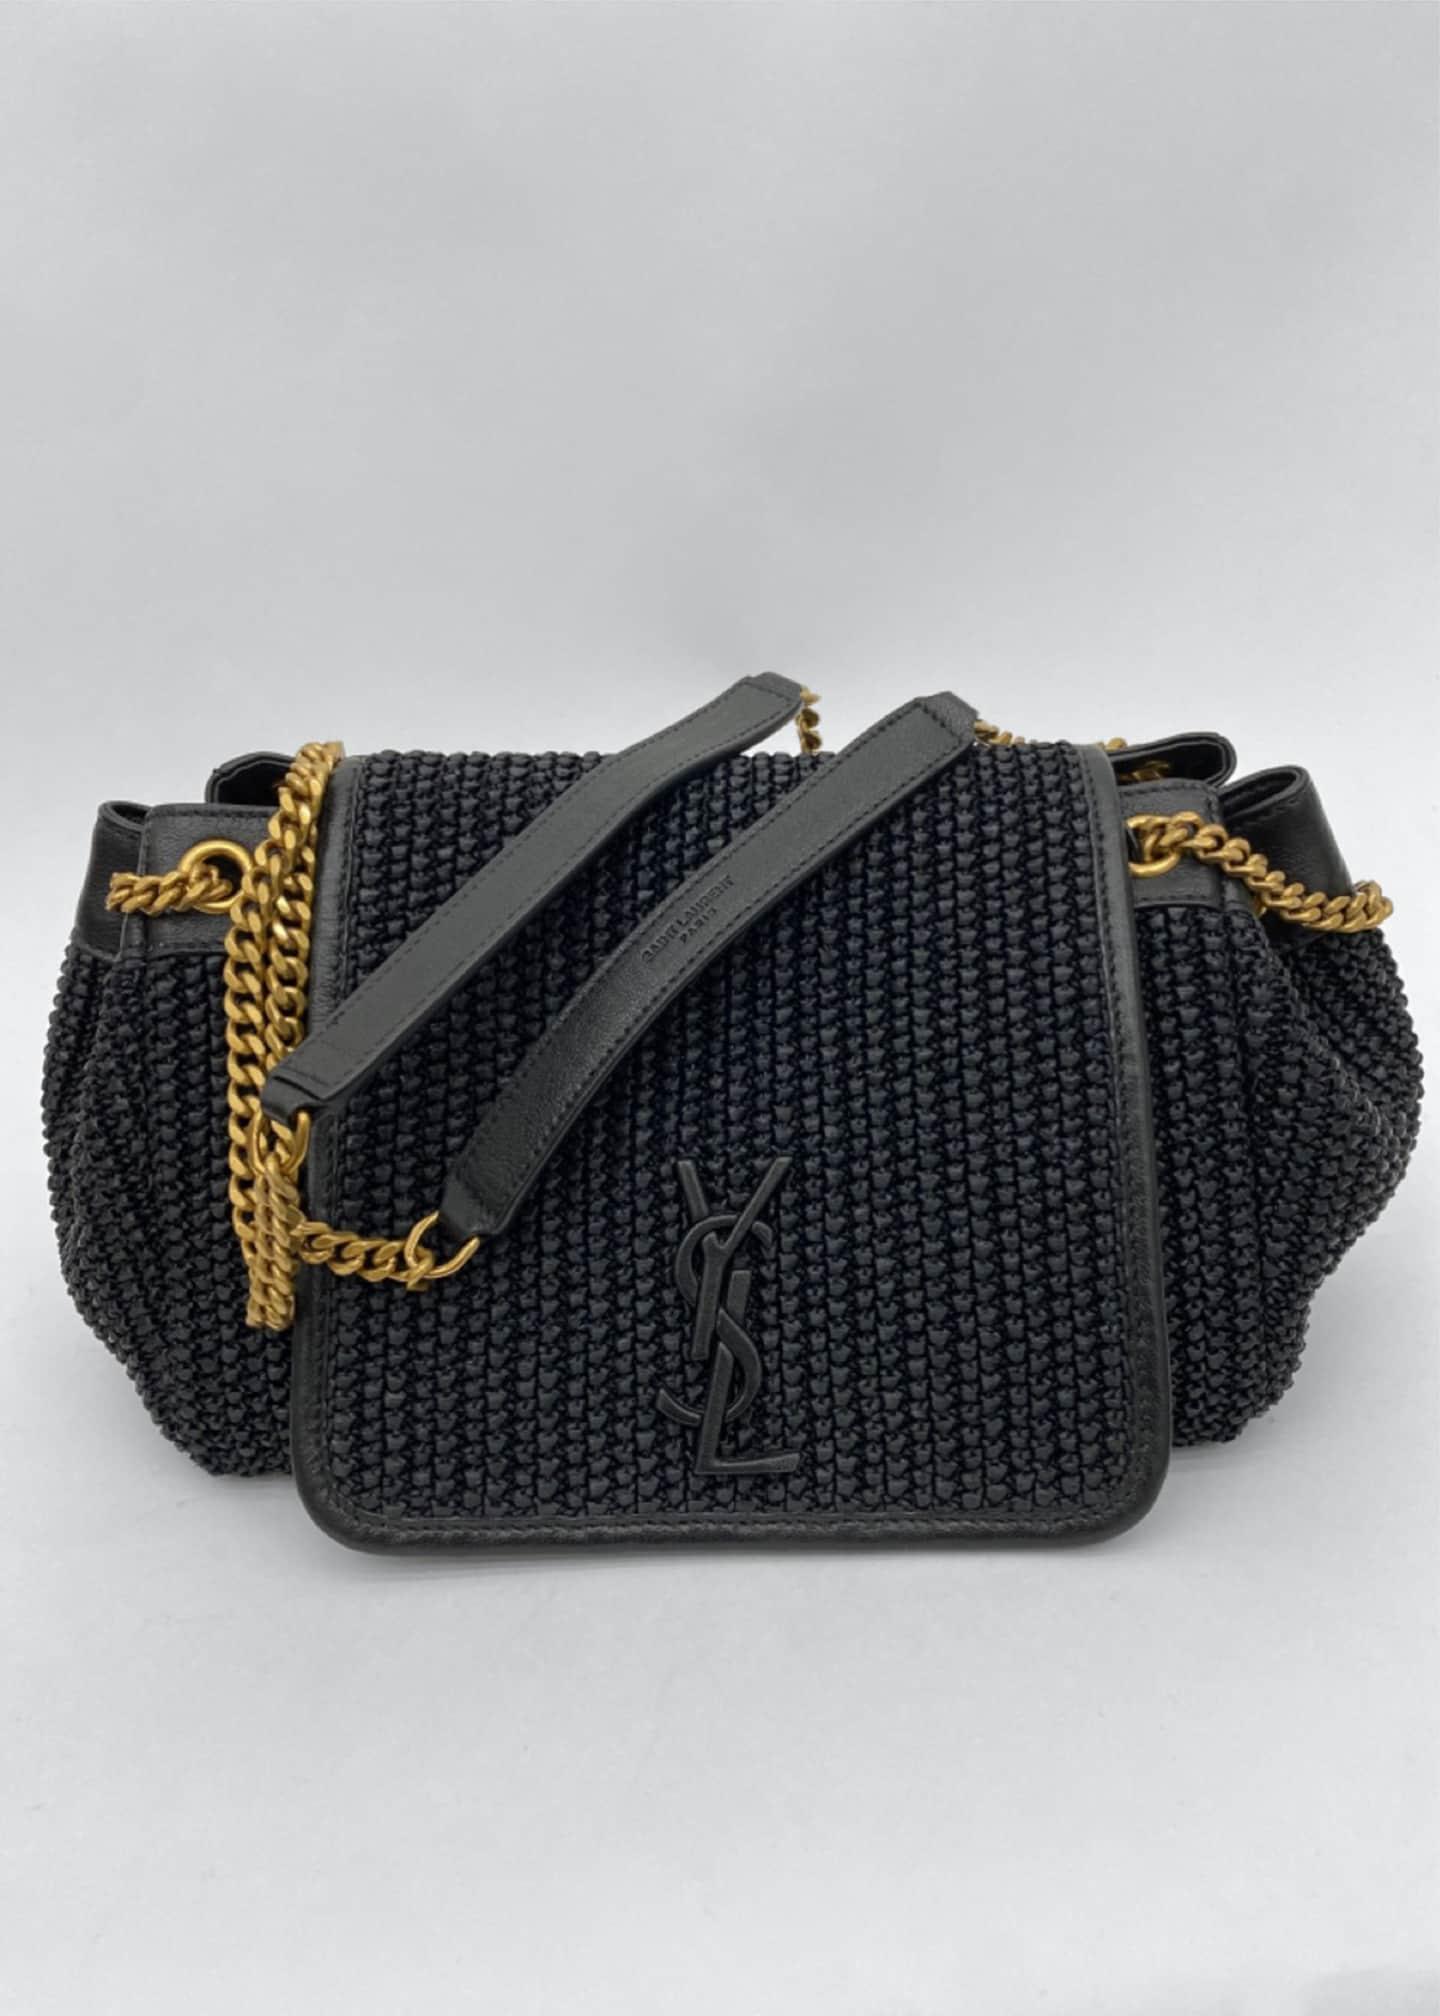 Saint Laurent Nolita Small YSL Monogram Shoulder Bag